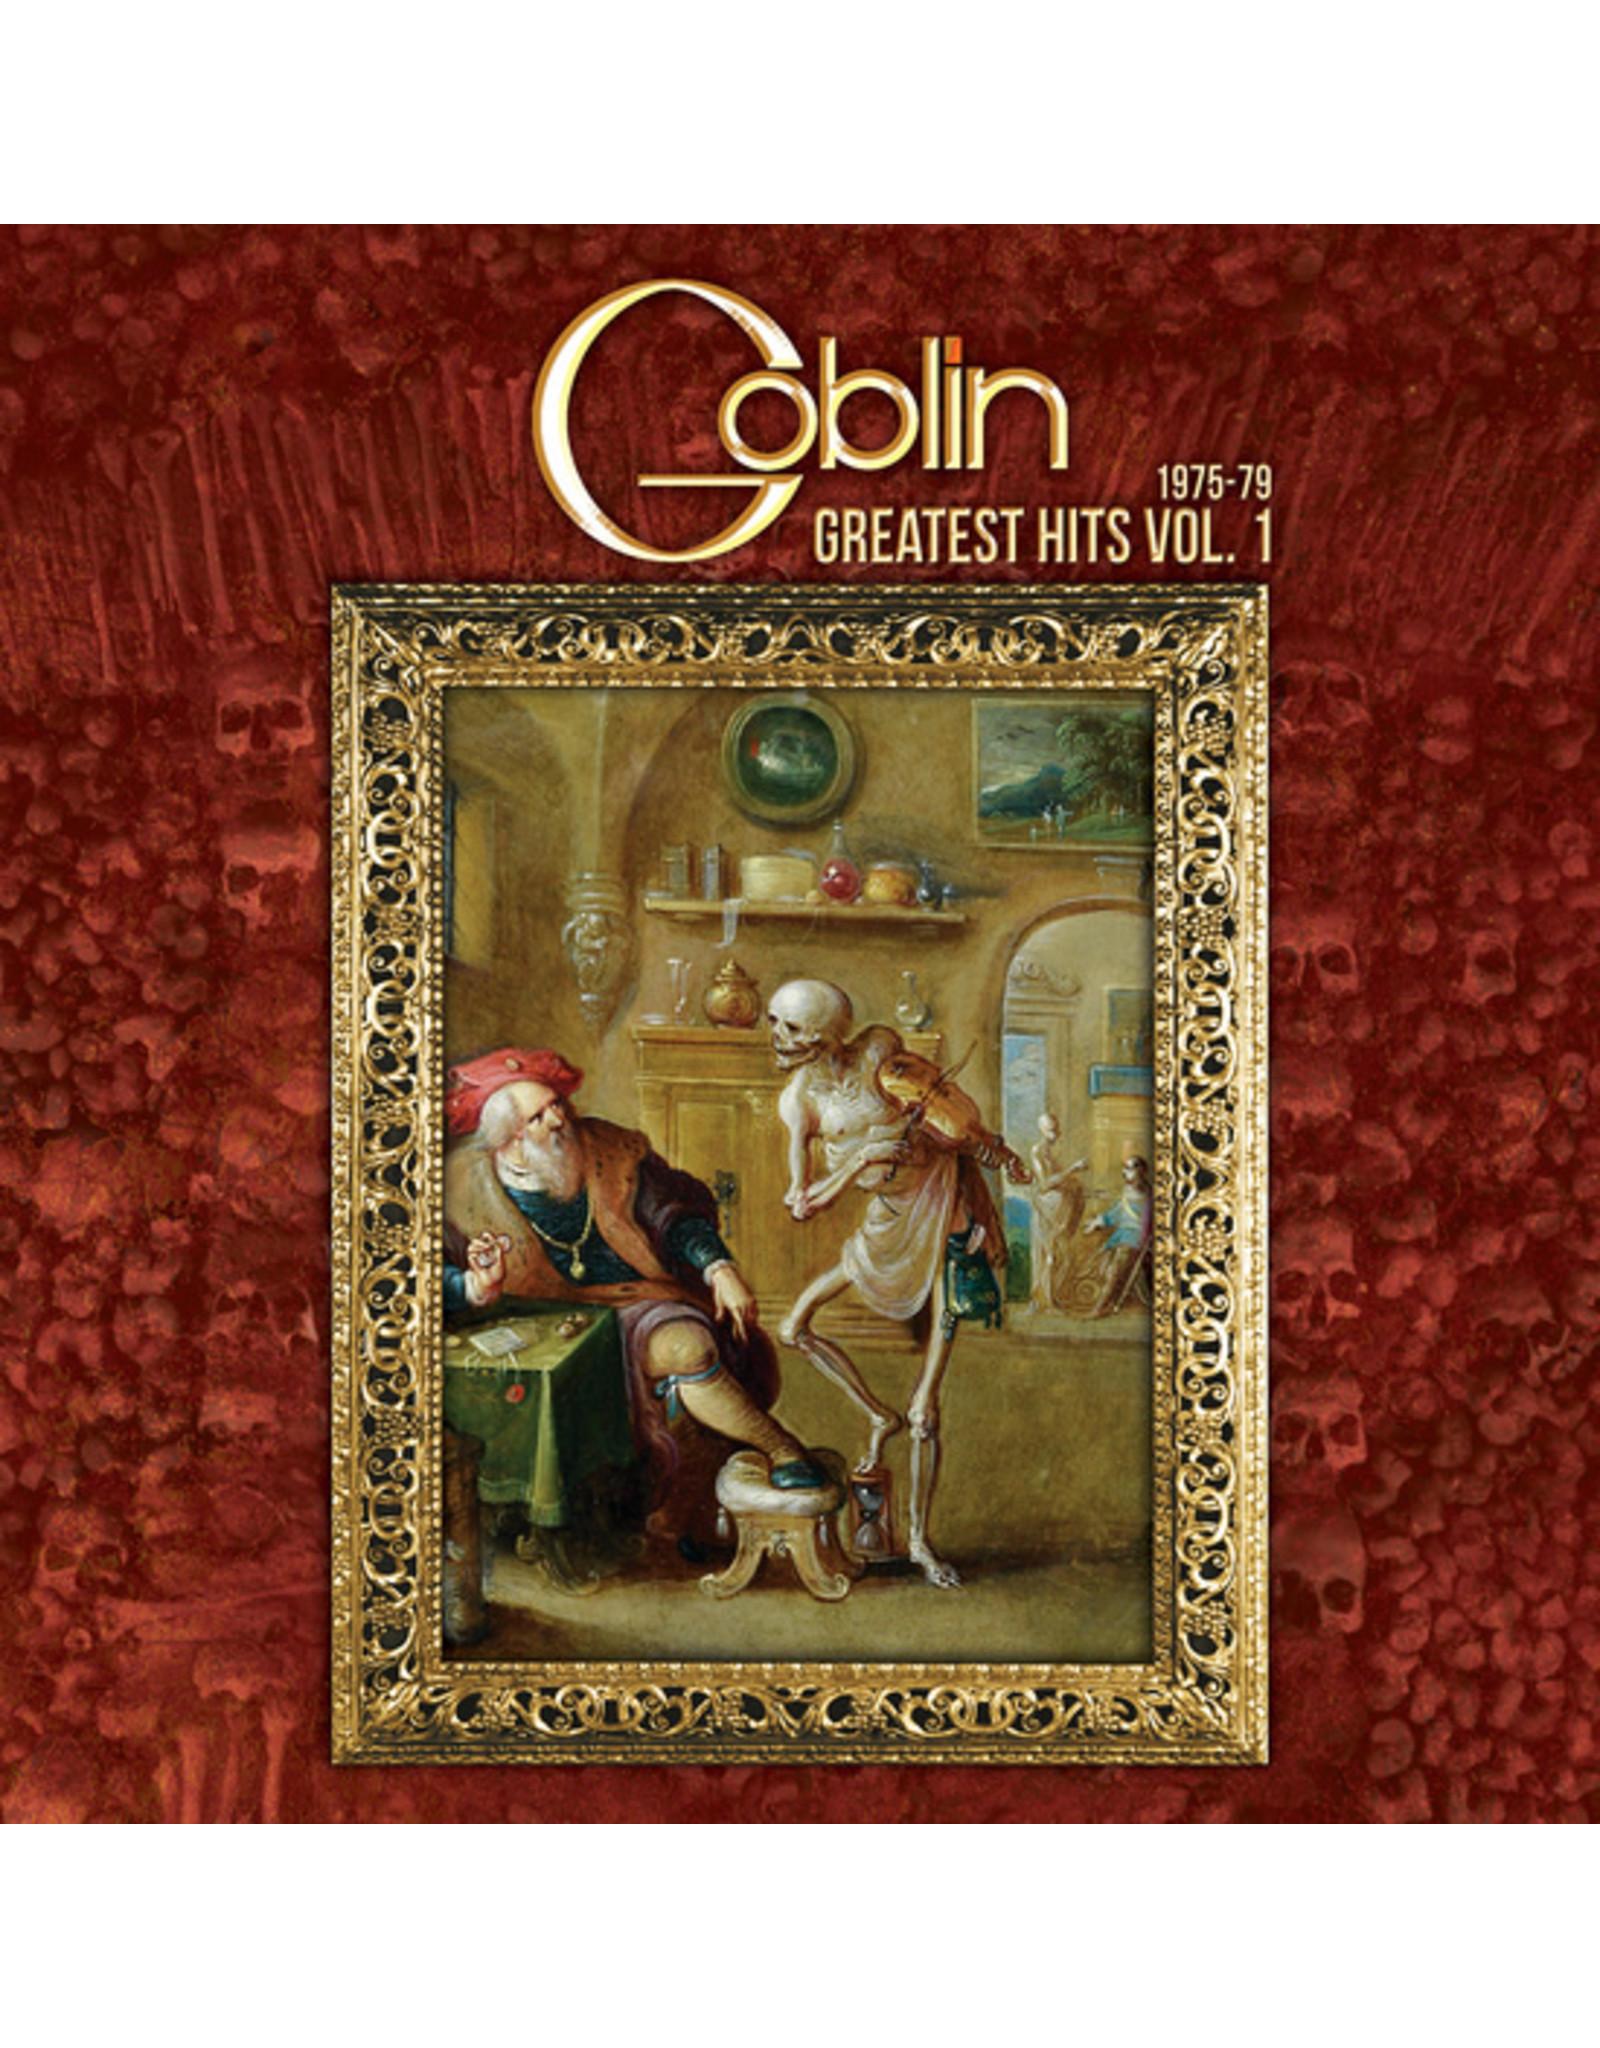 New Vinyl Goblin - Greatest Hits Vol. 1 1975-79 (Colored) LP